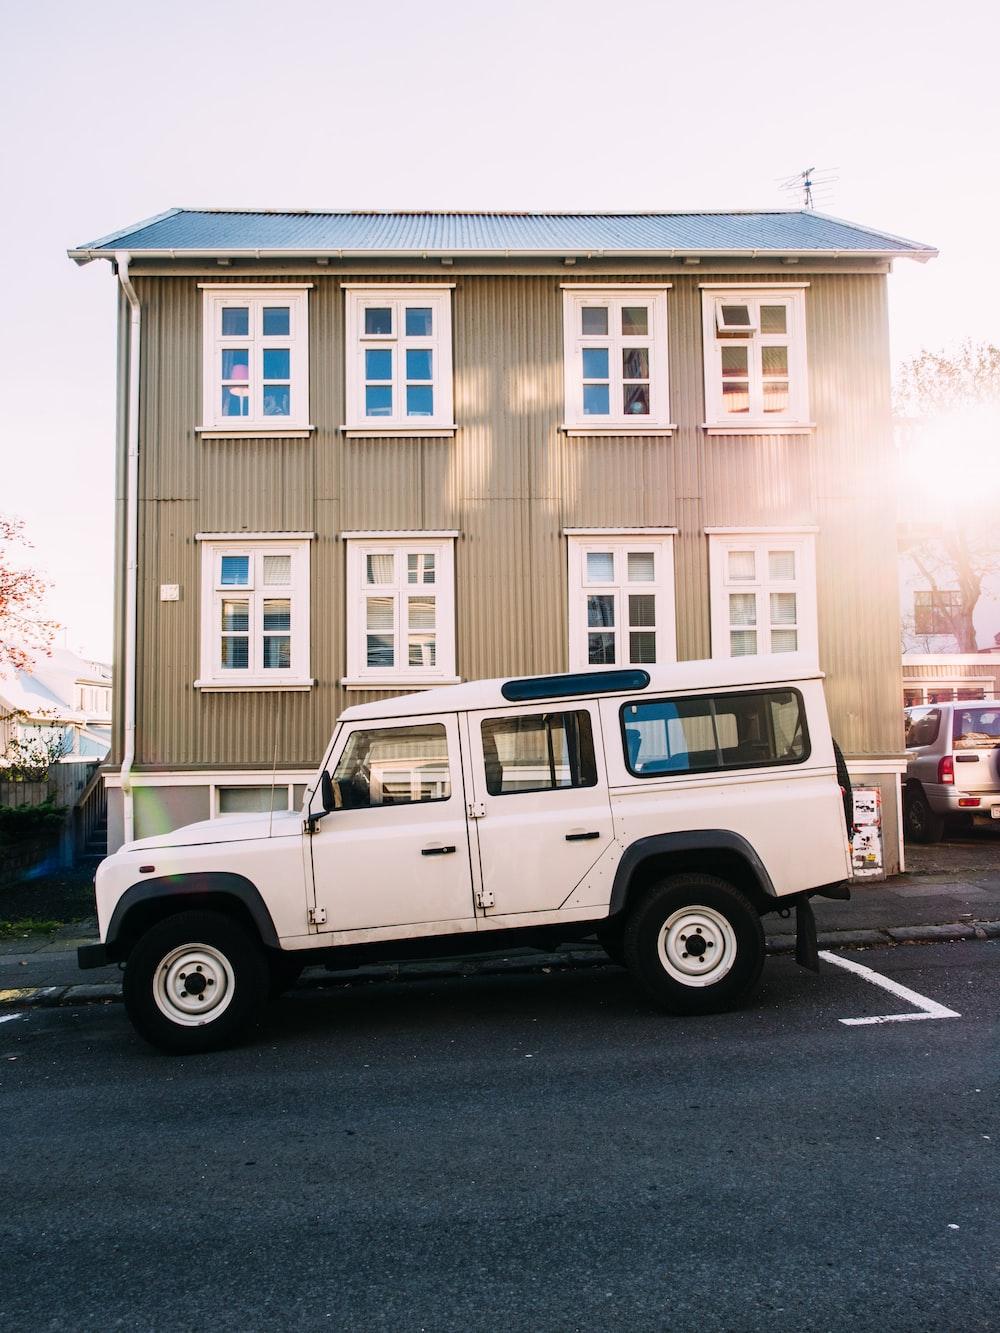 white vehicle near beige house